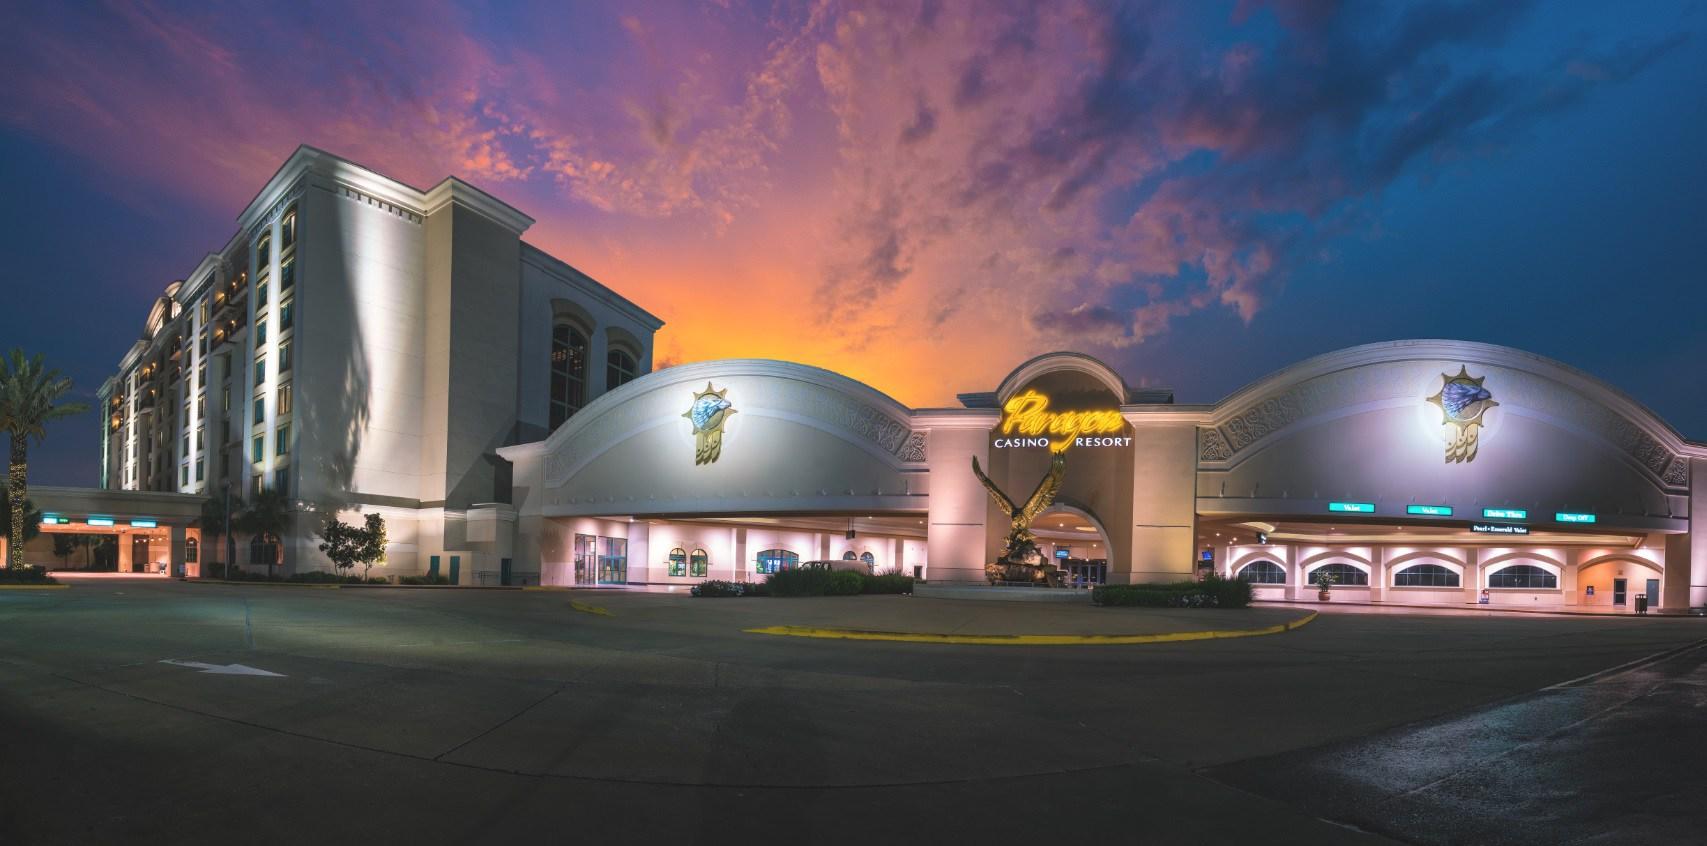 Paragon Casino Resort ( พาราก้อน คาสิโน รีสอร์ท )